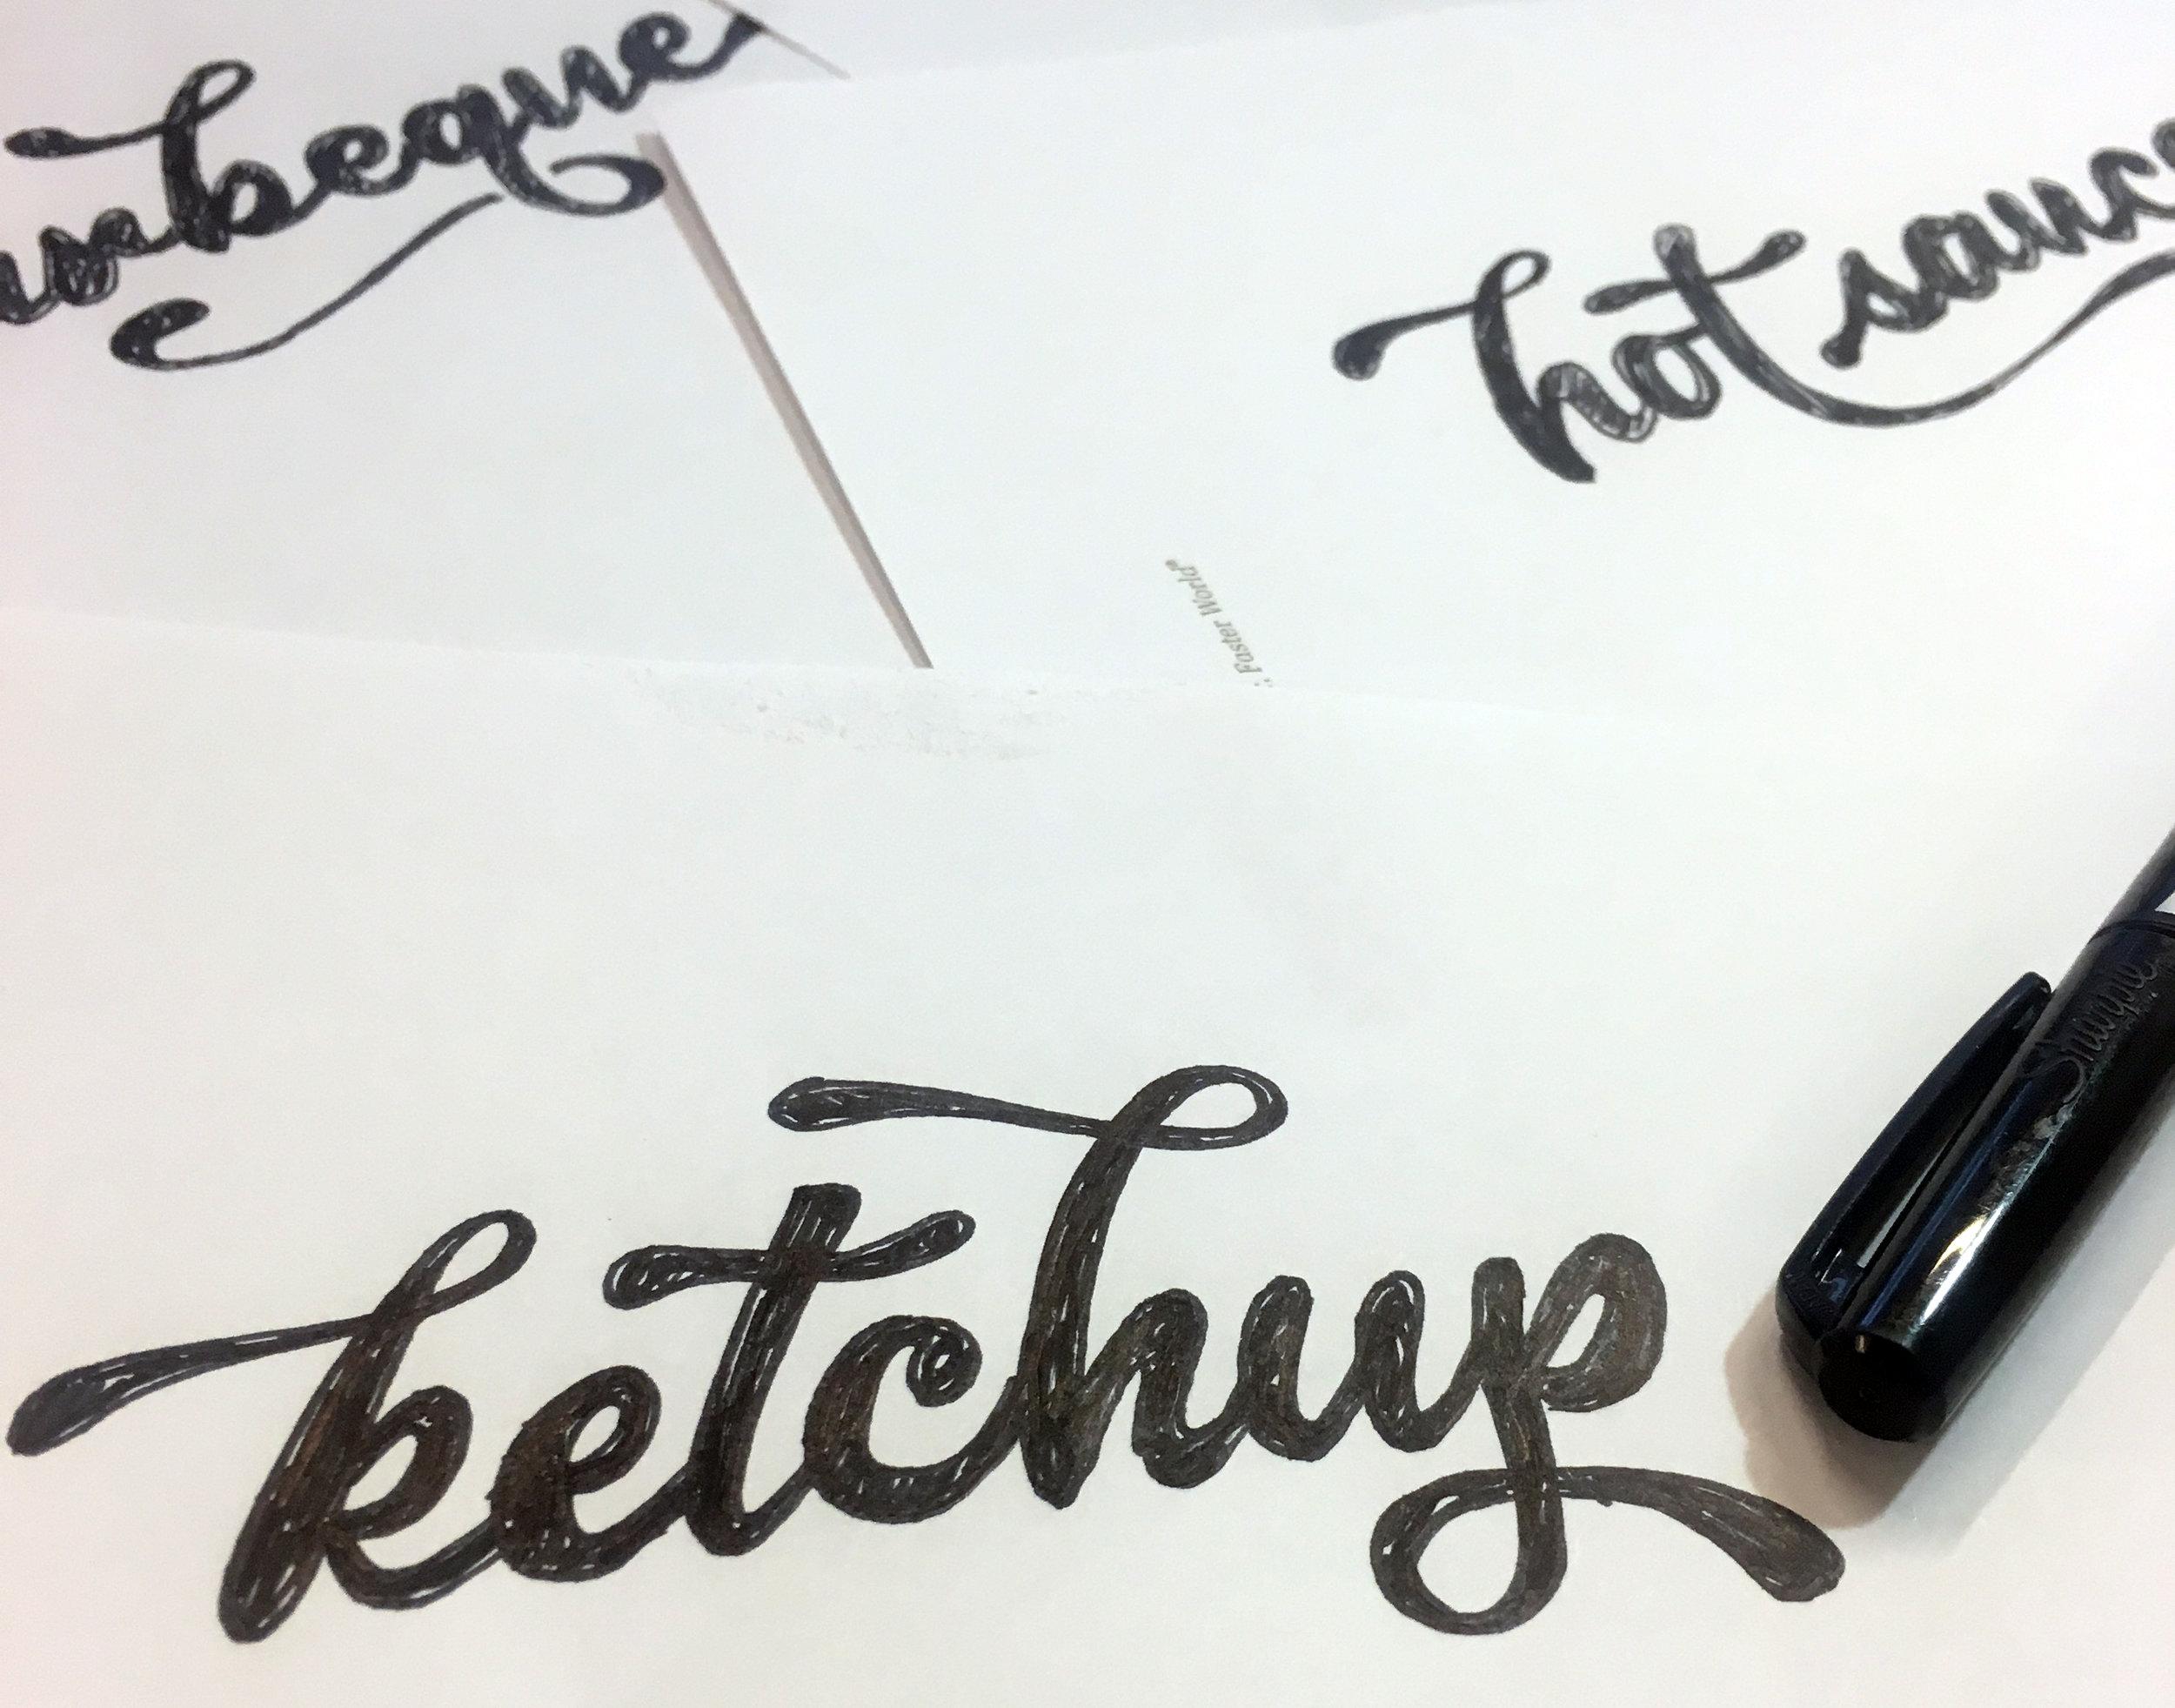 letteringketchup.jpg